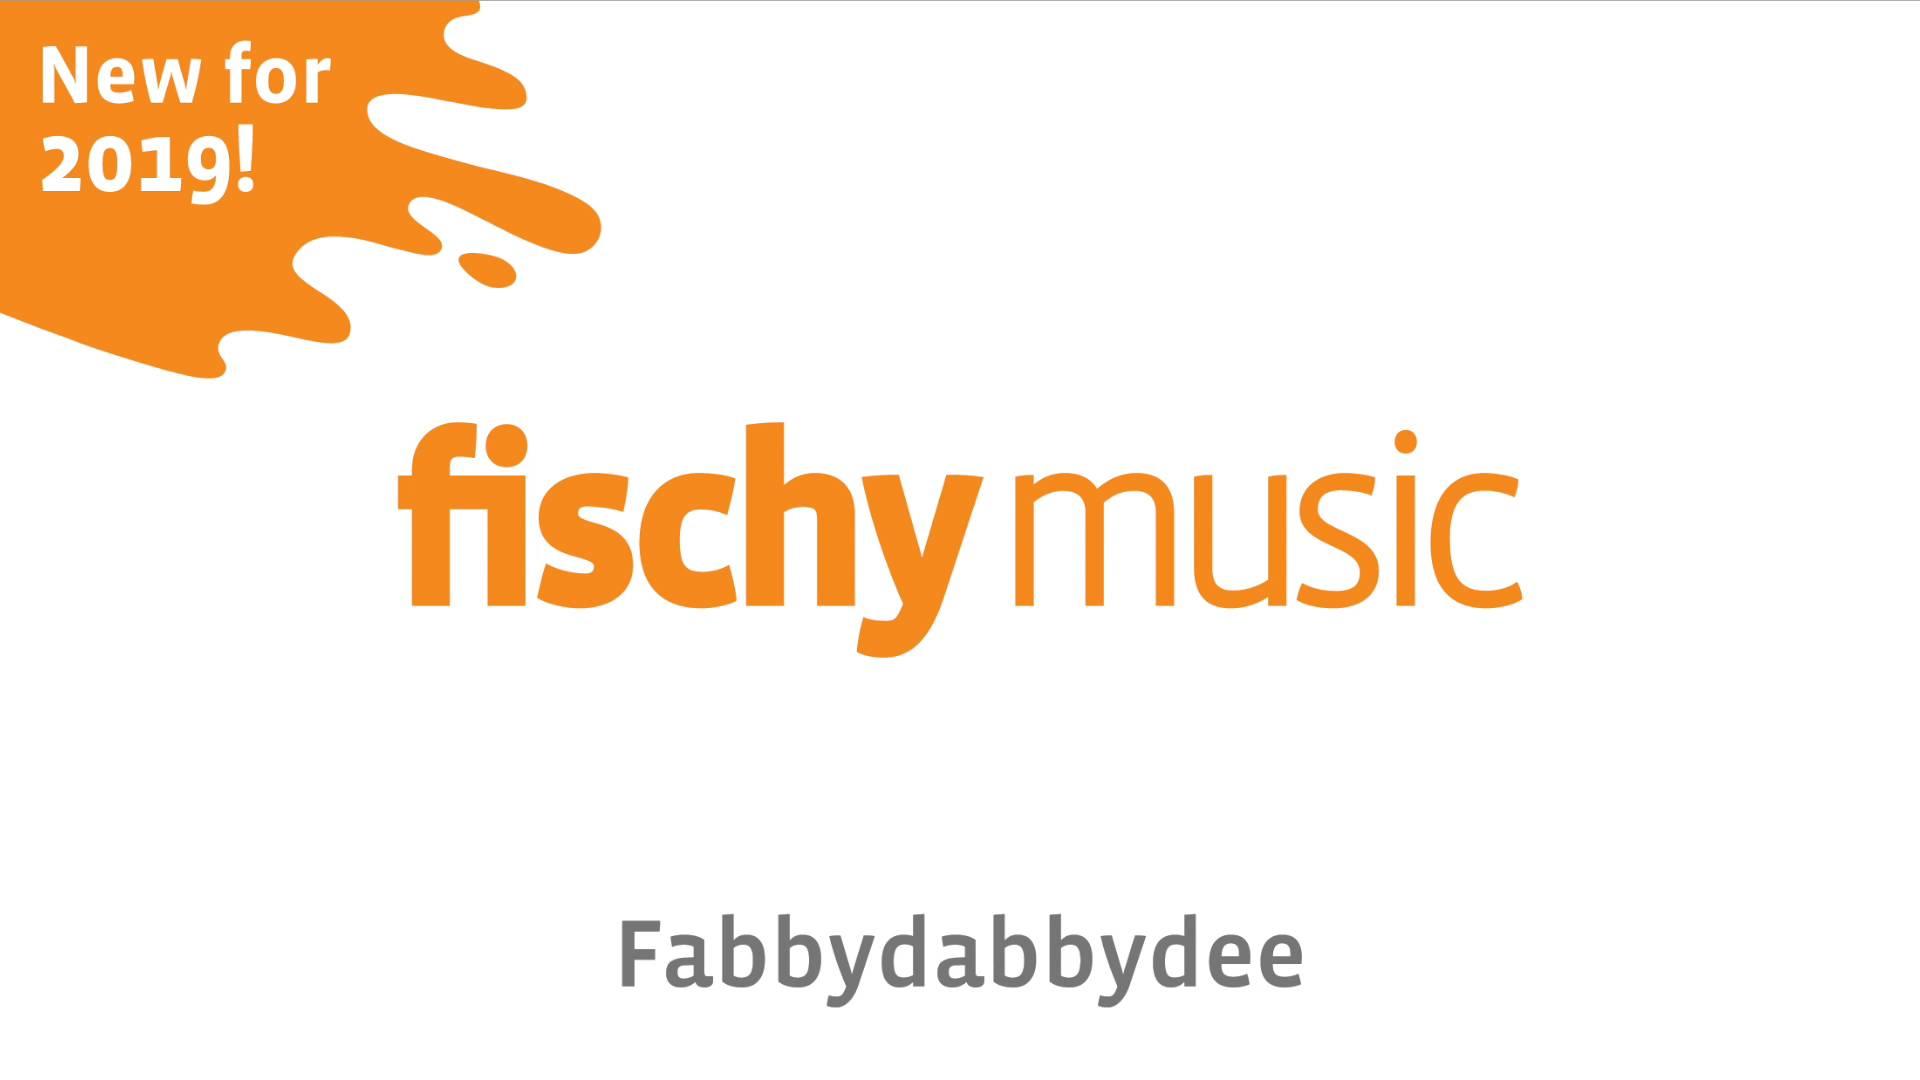 Fabbydabbydee (ages 3-7)